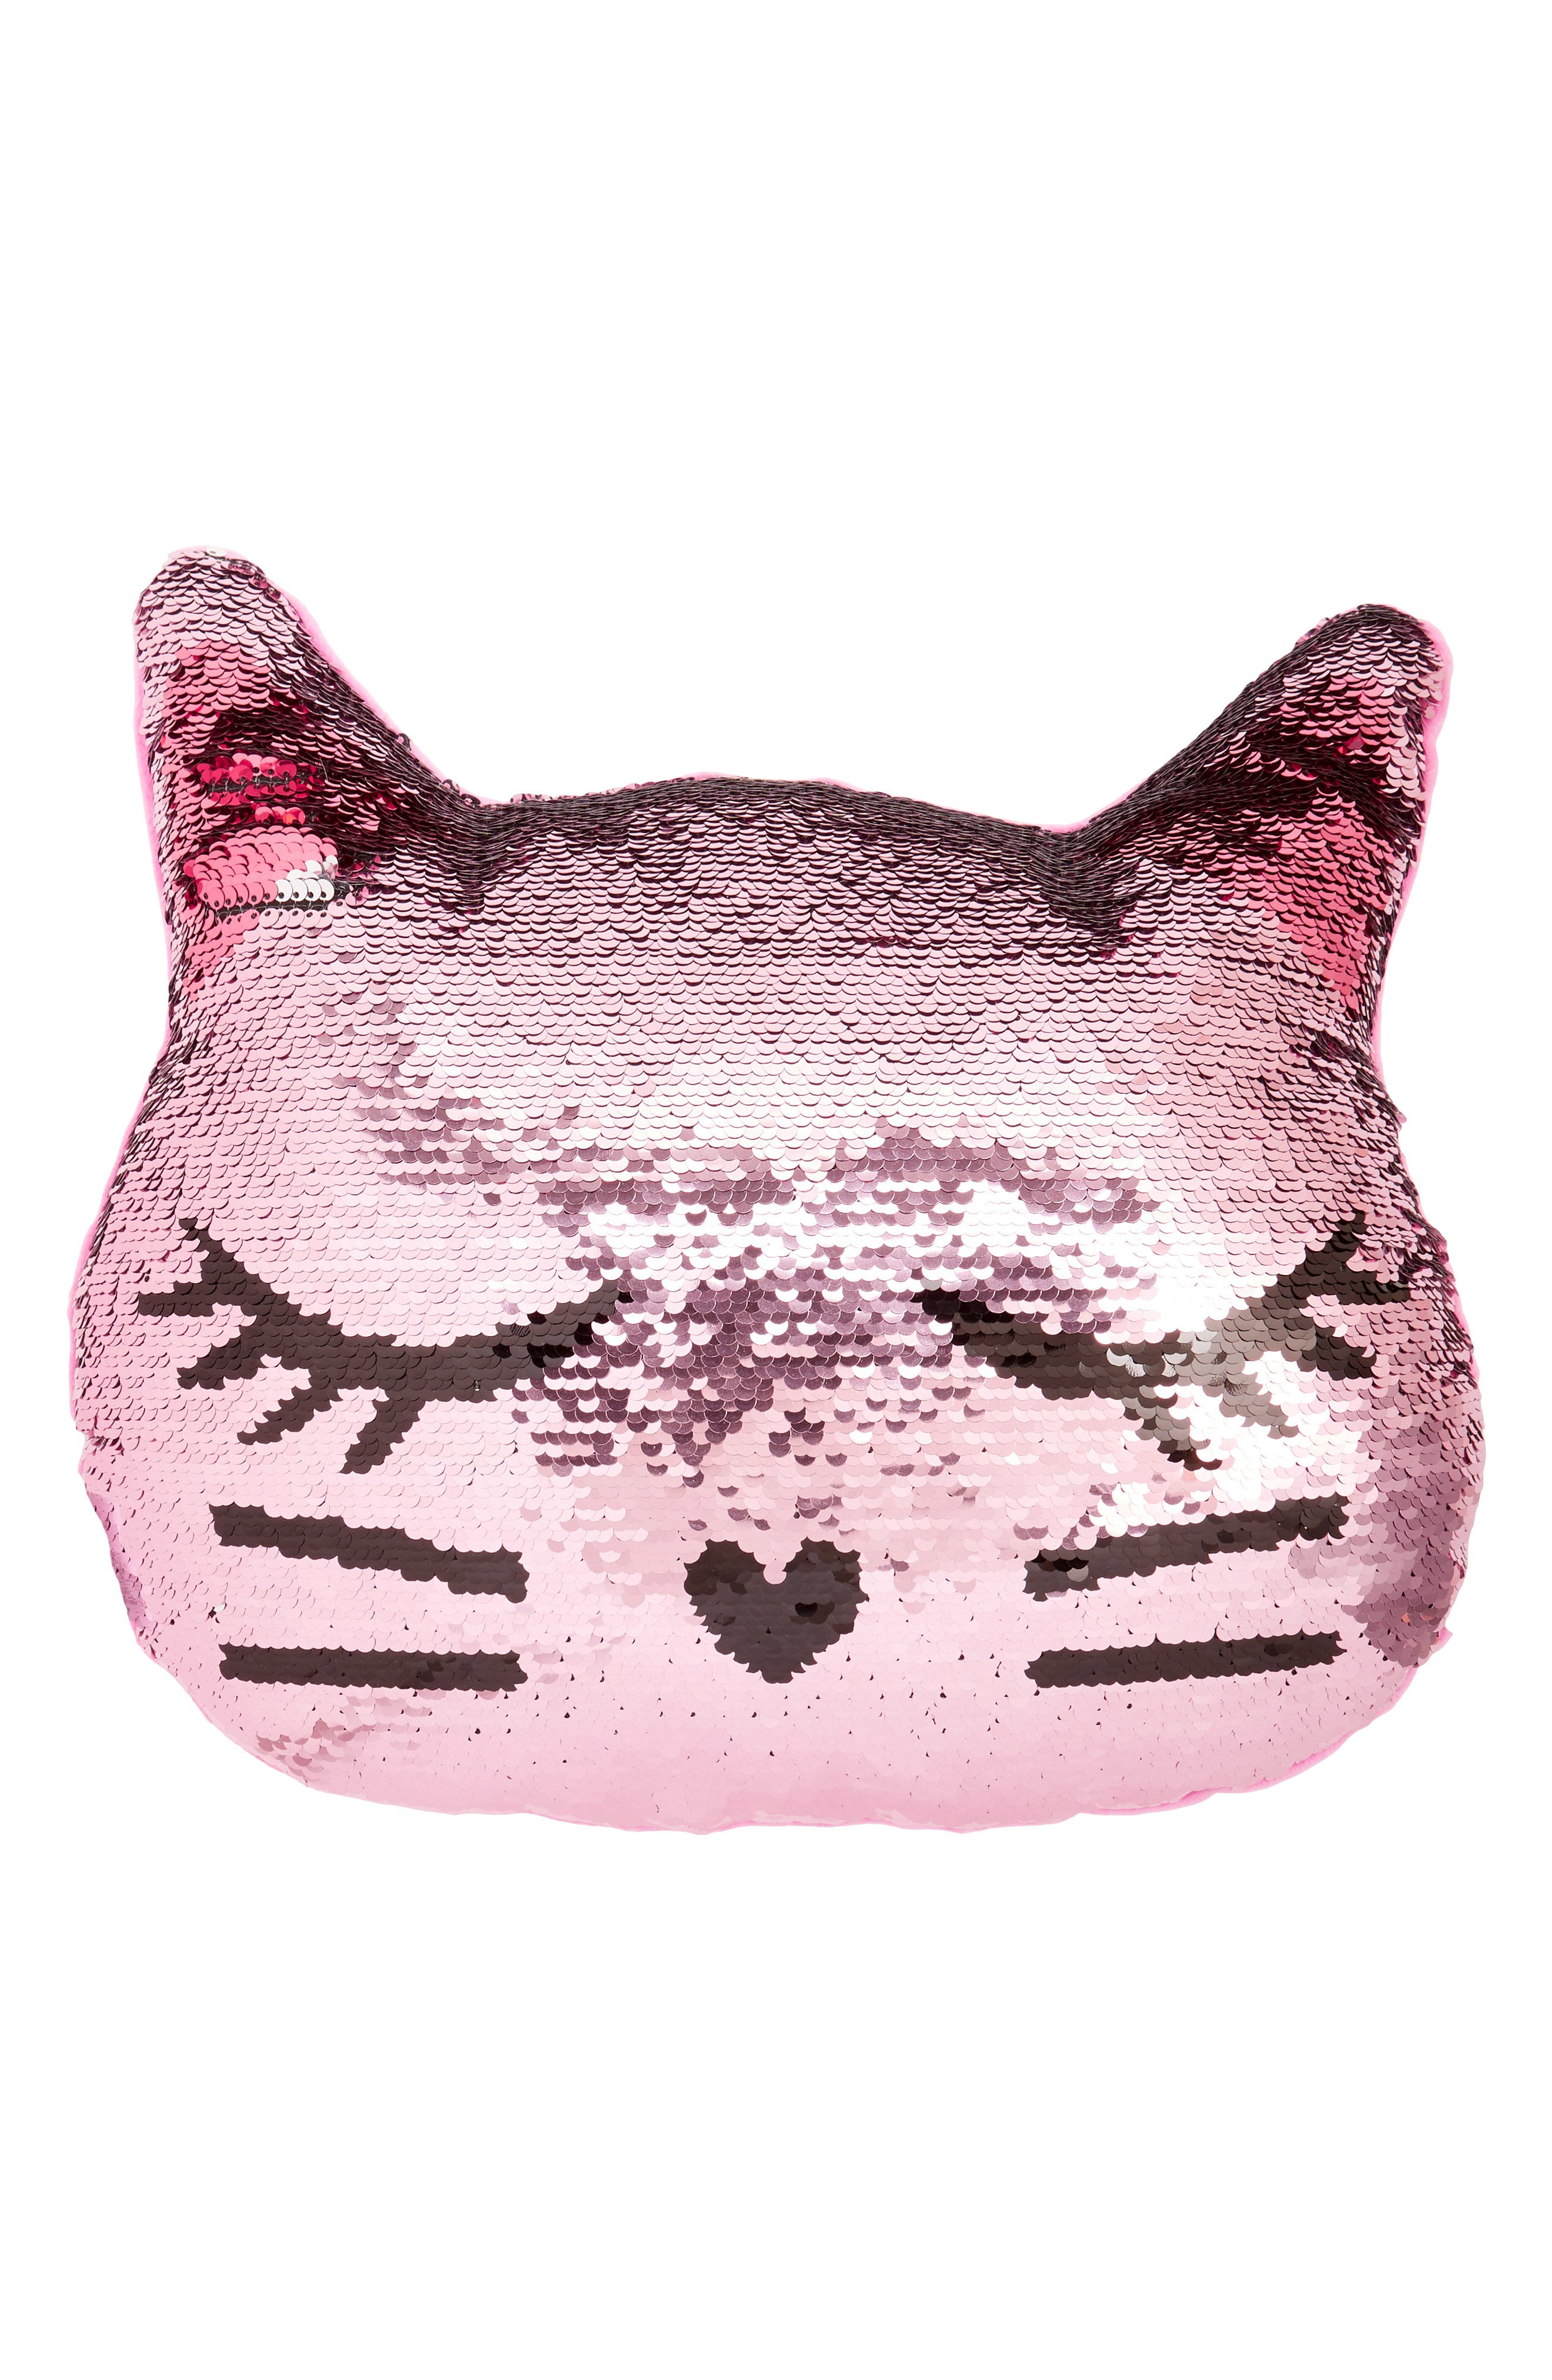 Reversible Sequin Cat Pillow,                         Main,                         color, Silver Combo